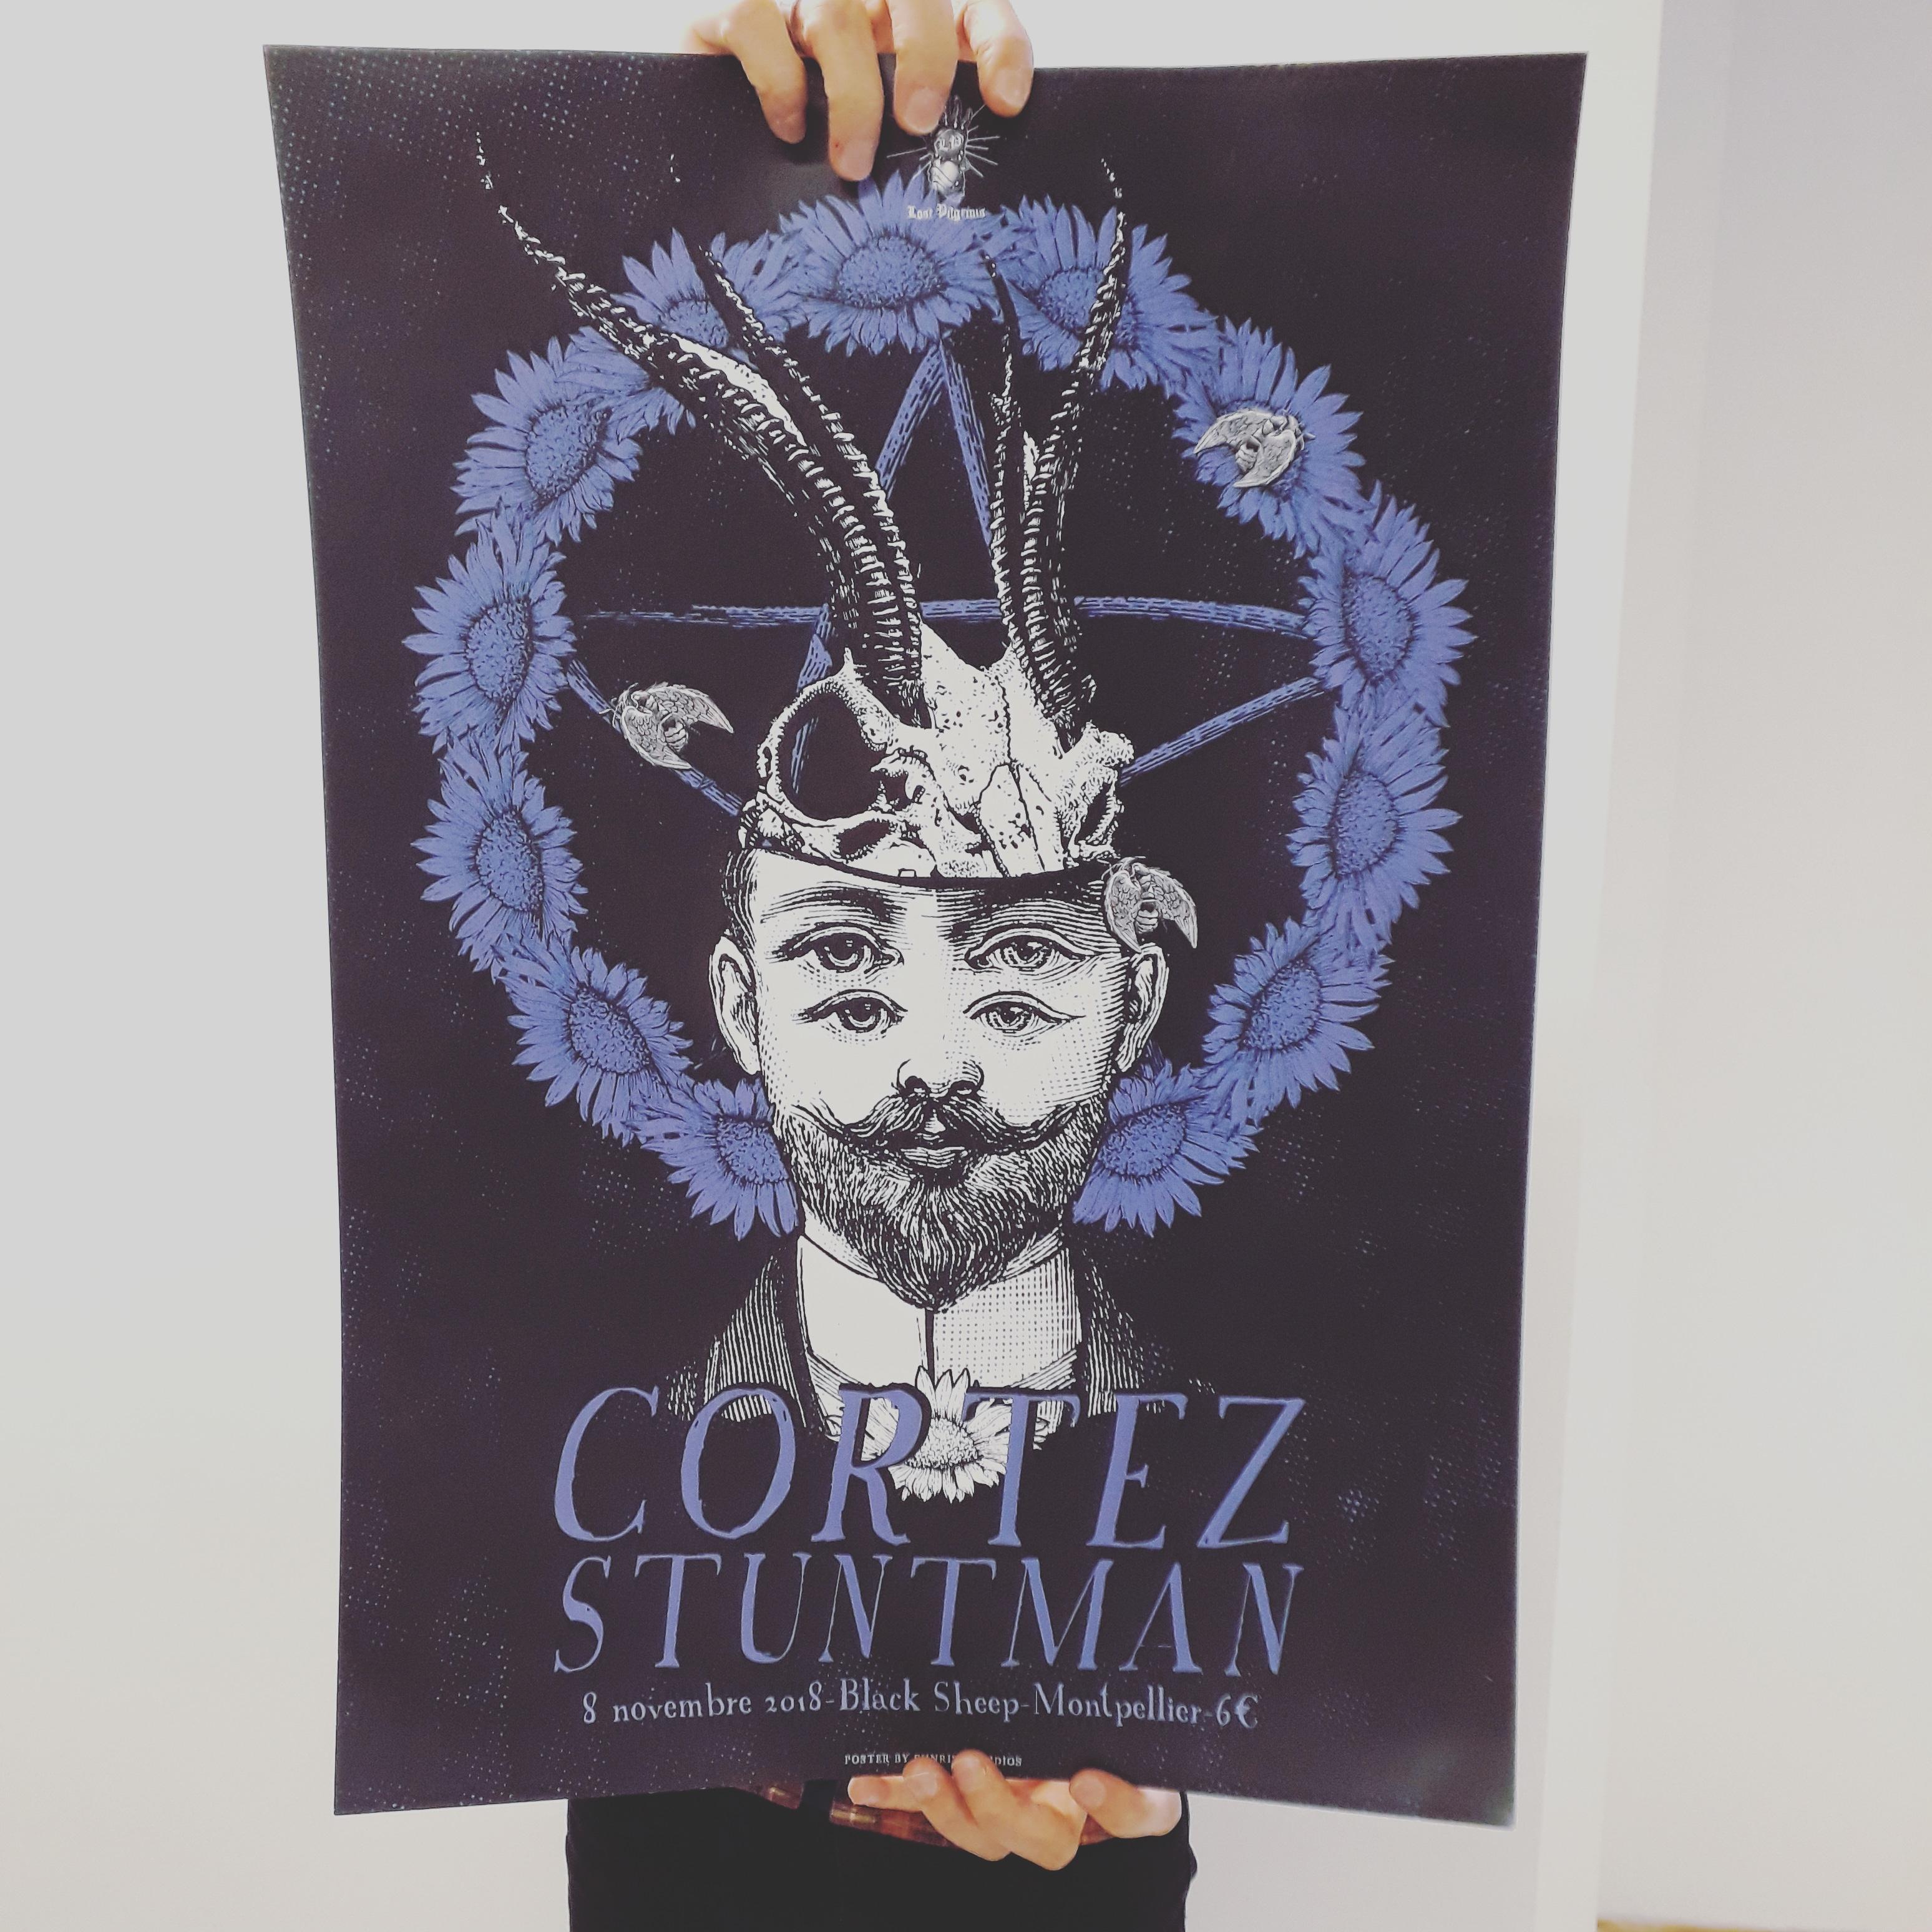 CORTEZ / STUNTMAN